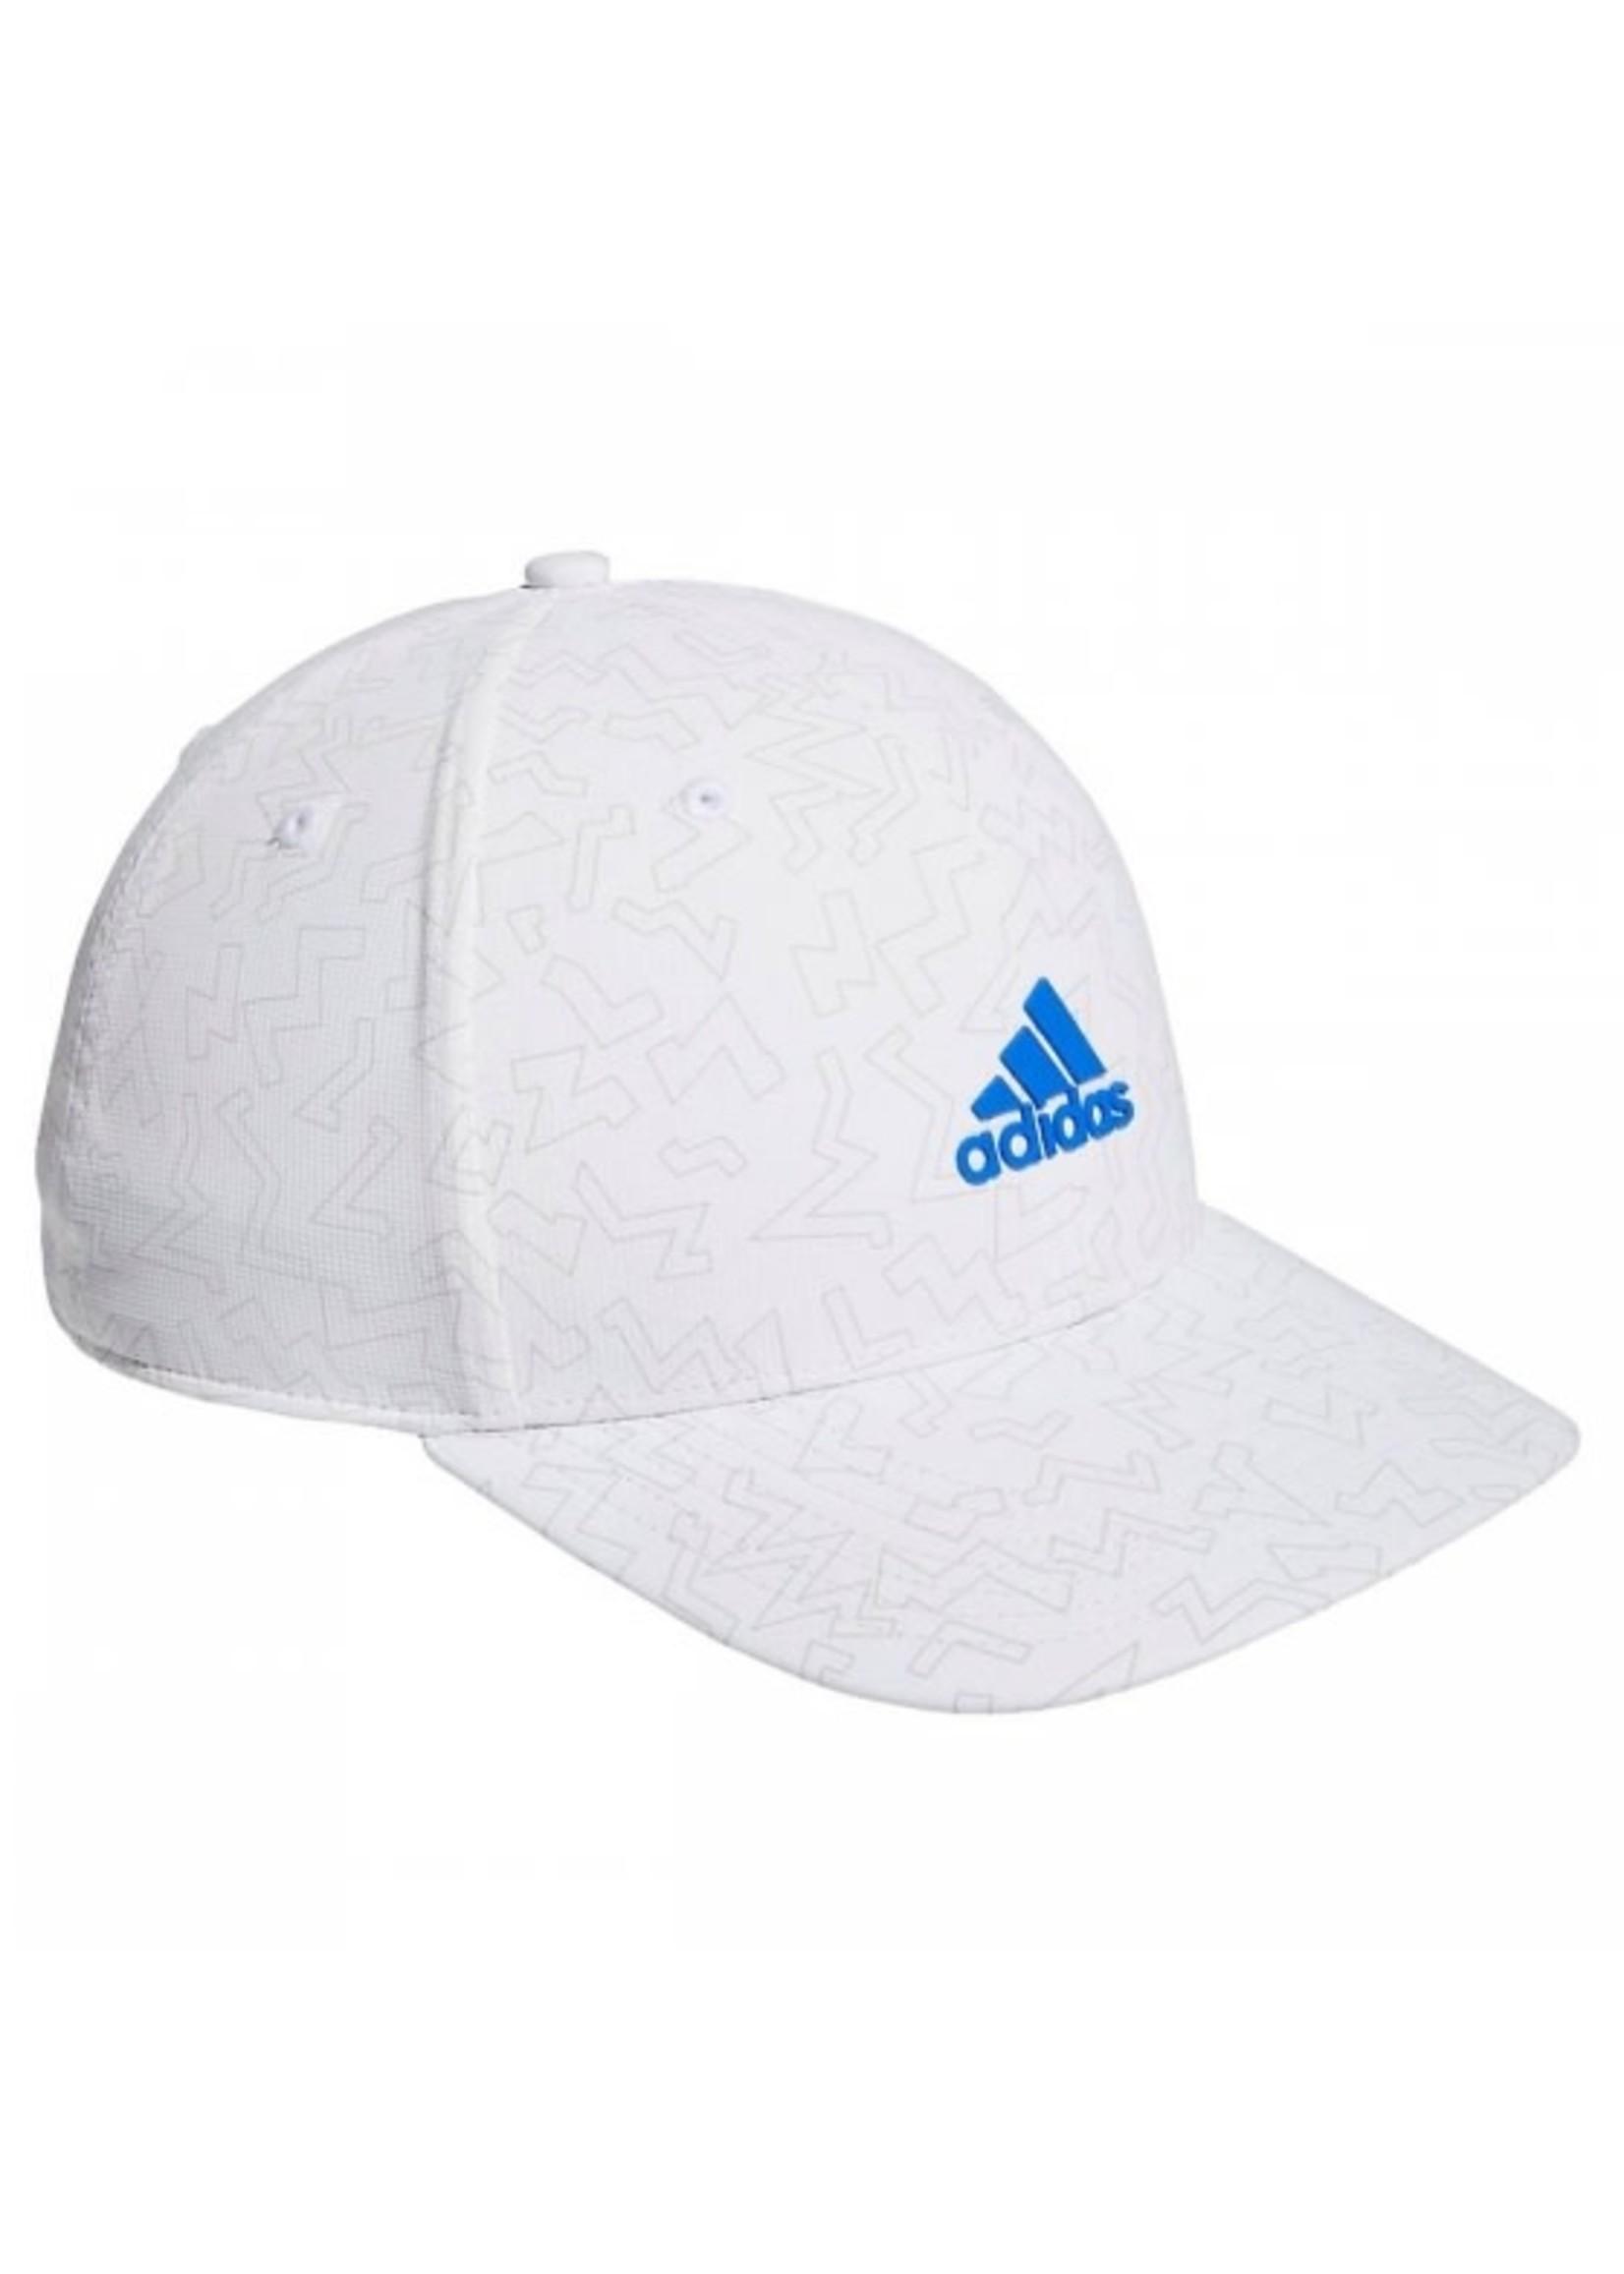 Adidas Adidas Colour Pop Golf Cap, White/Blue